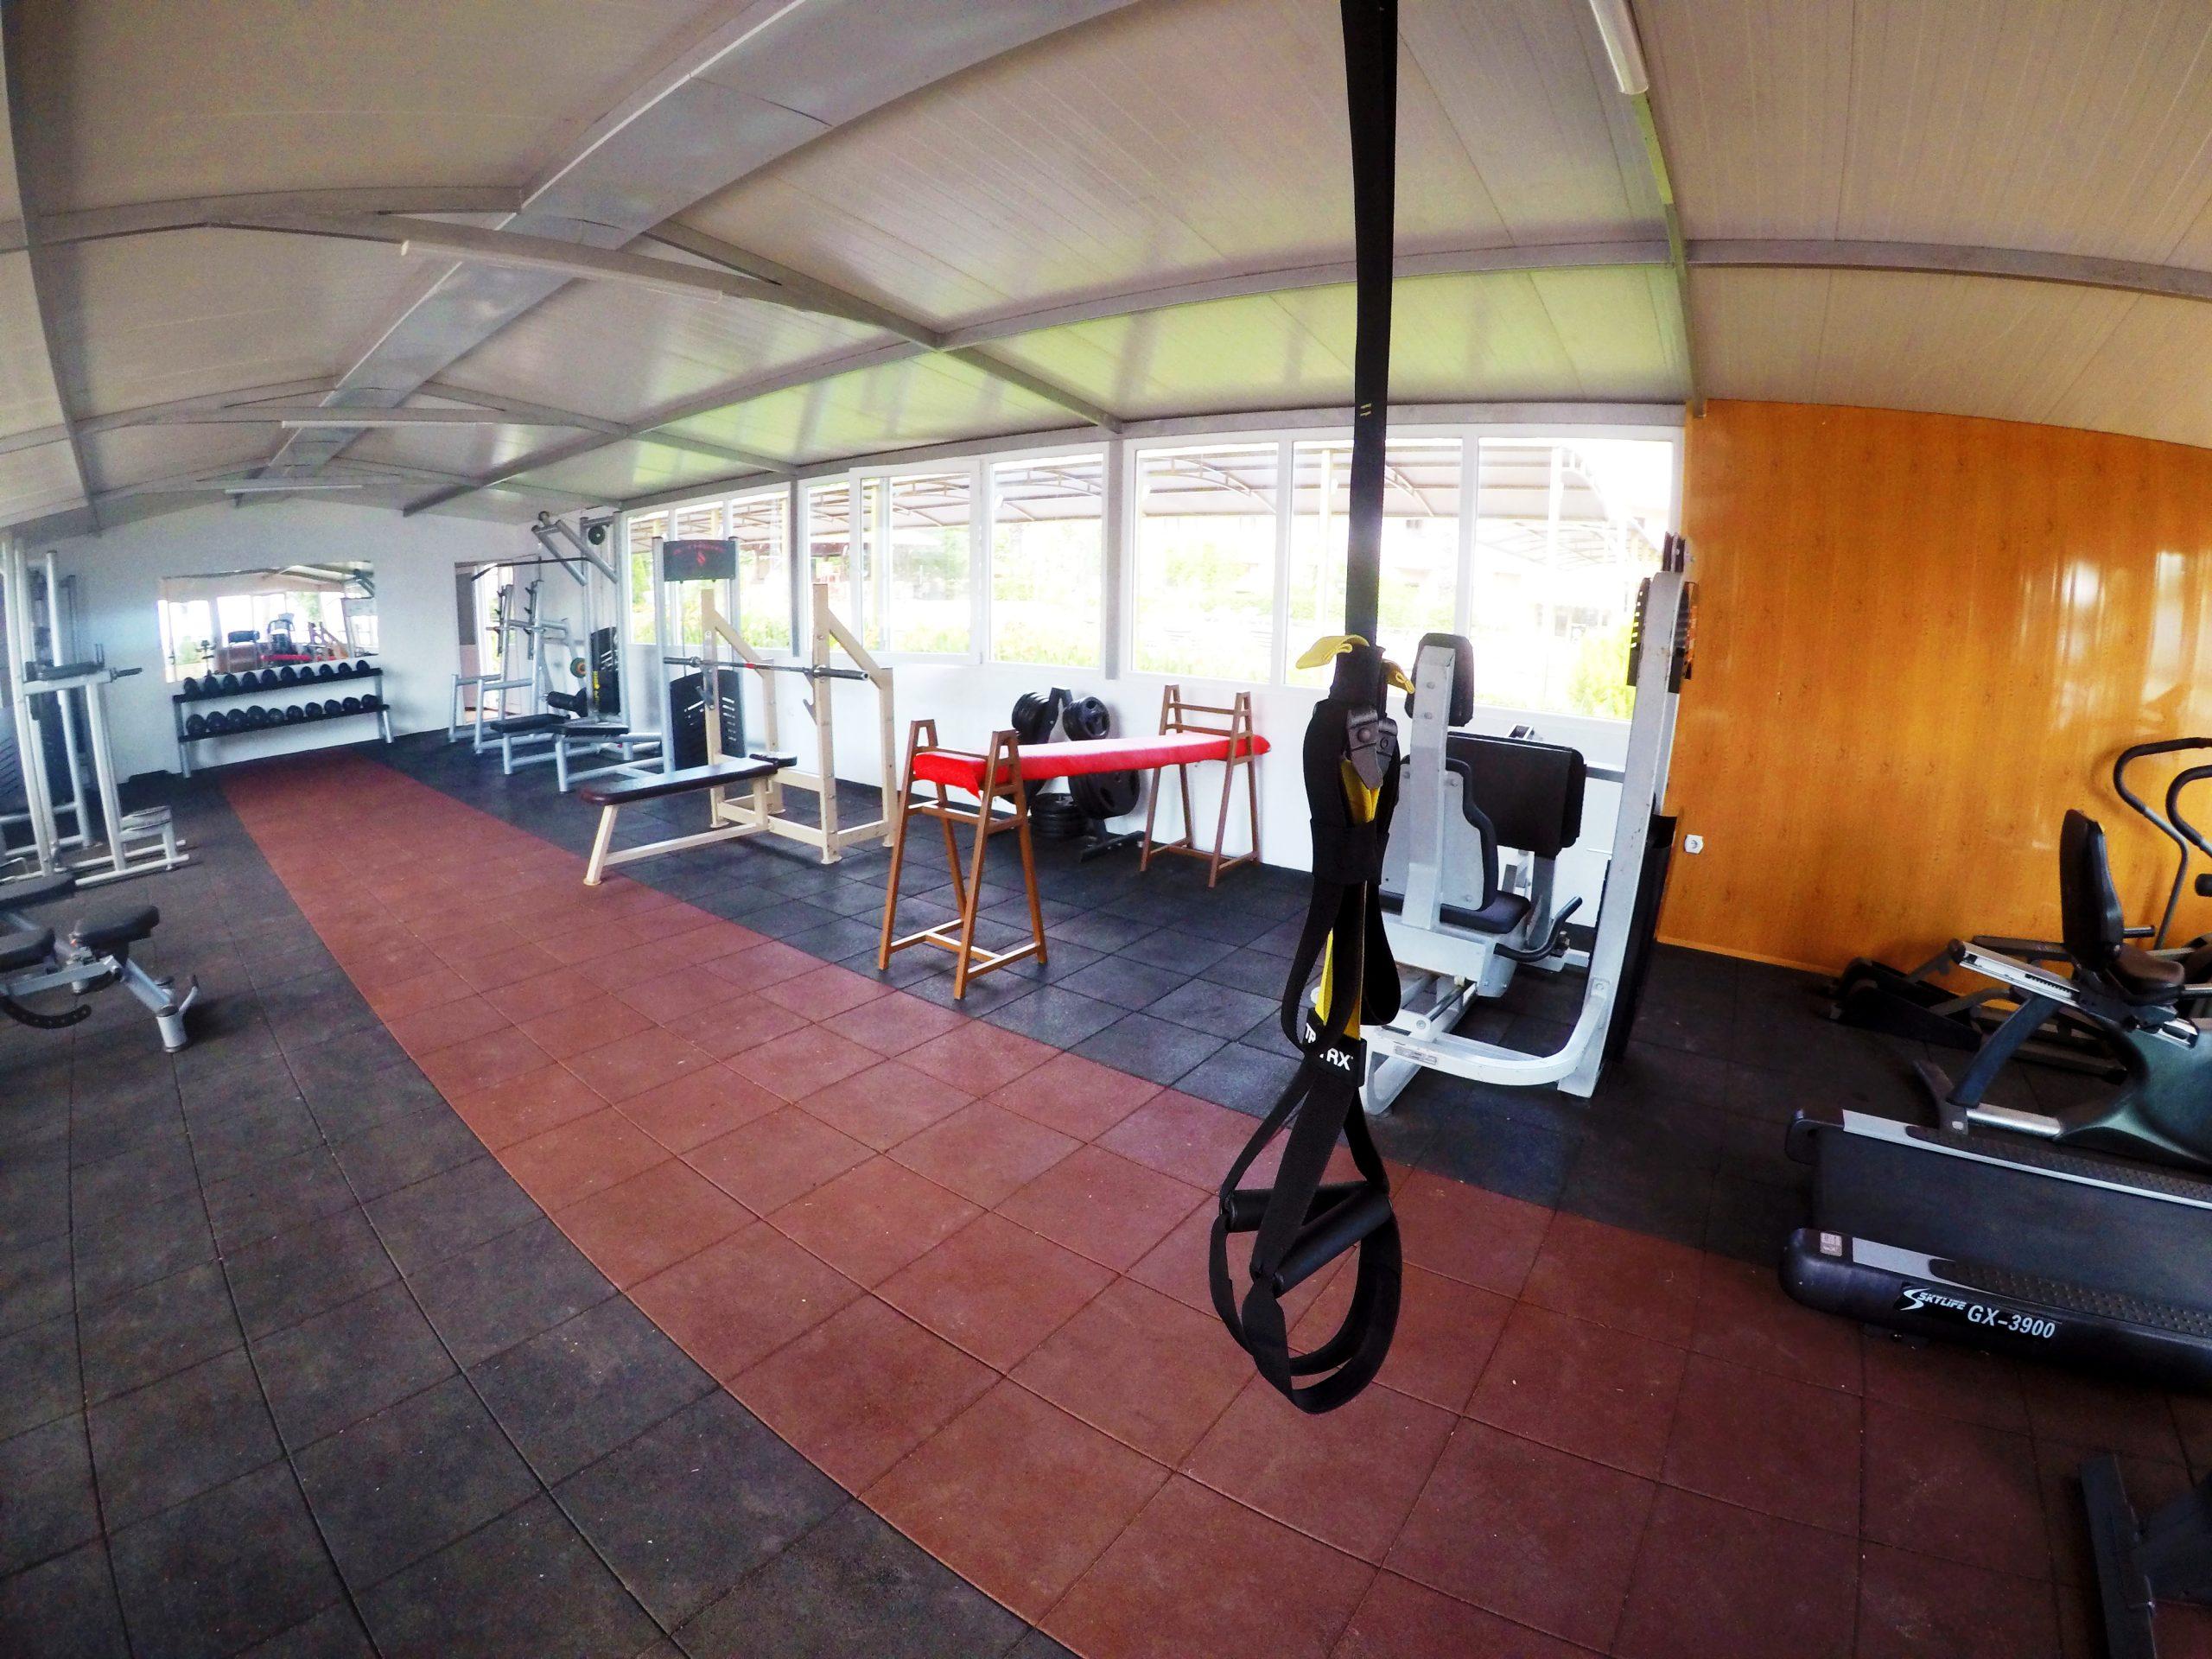 Panorama-Plaza-Kraftraum-Fitness